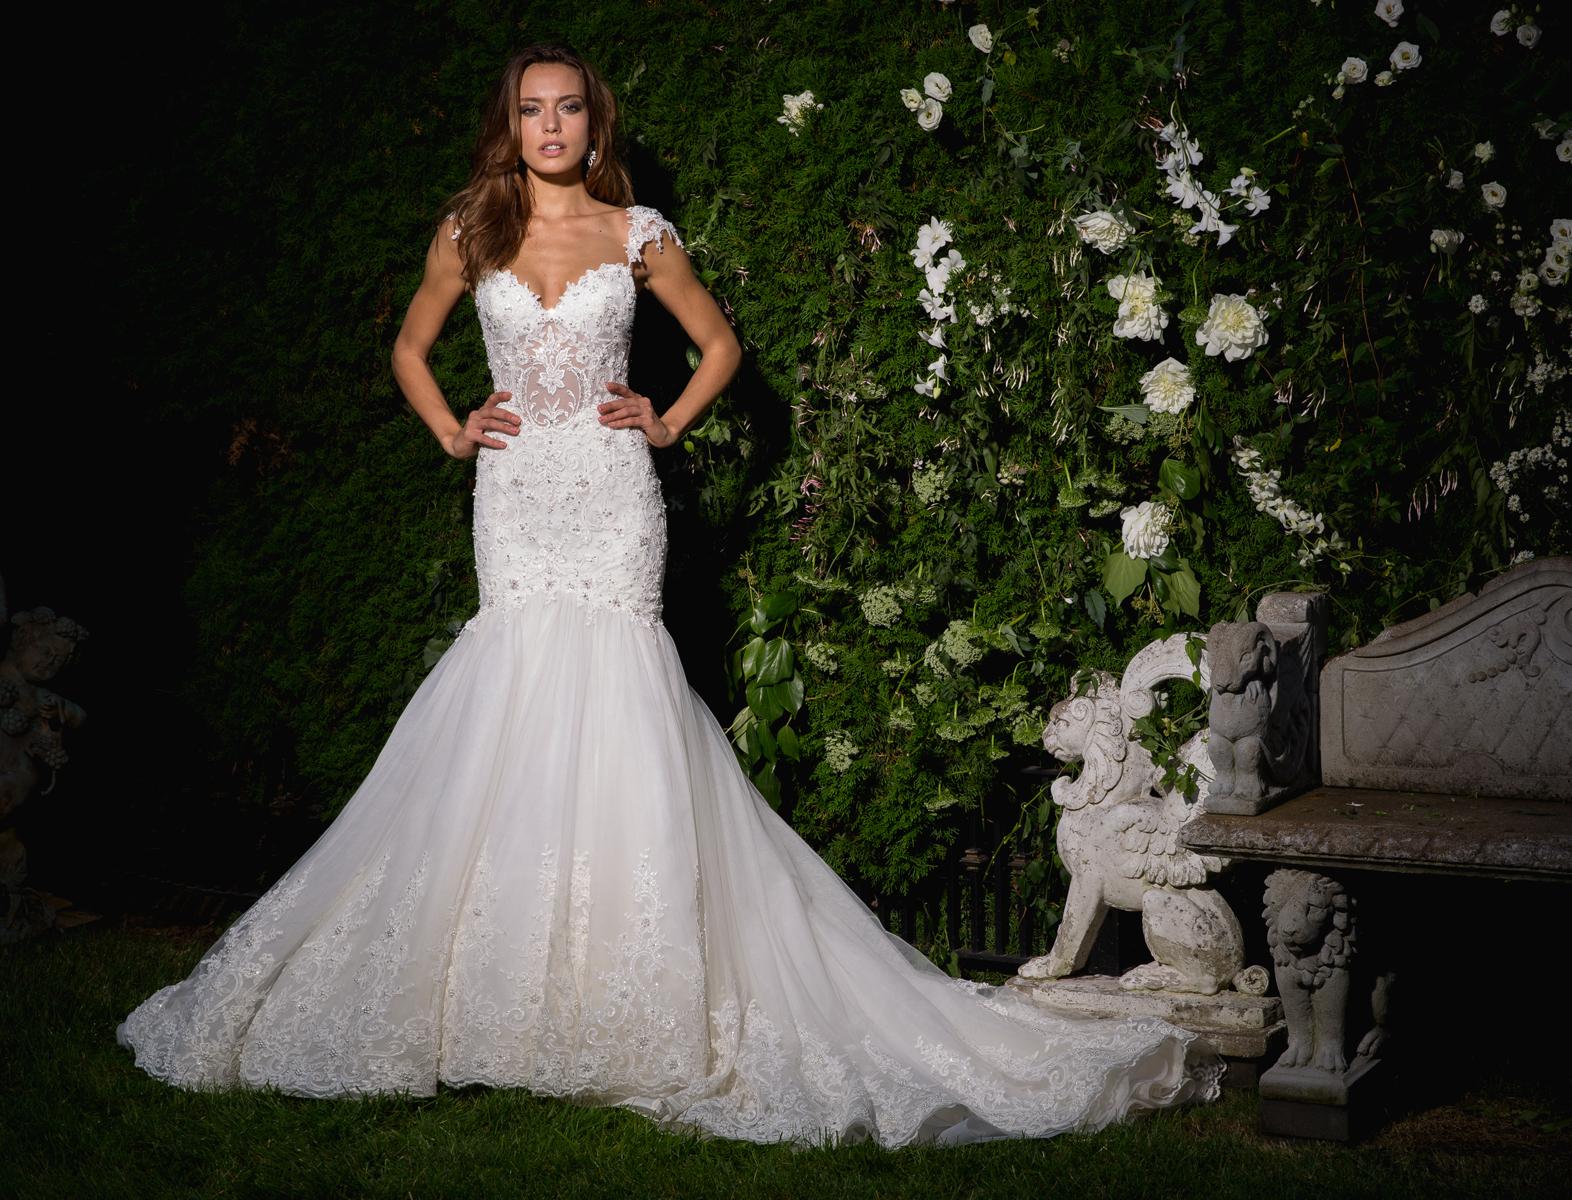 Eve of milady wedding dresses with - Romantic Mermaid Wedding Dress